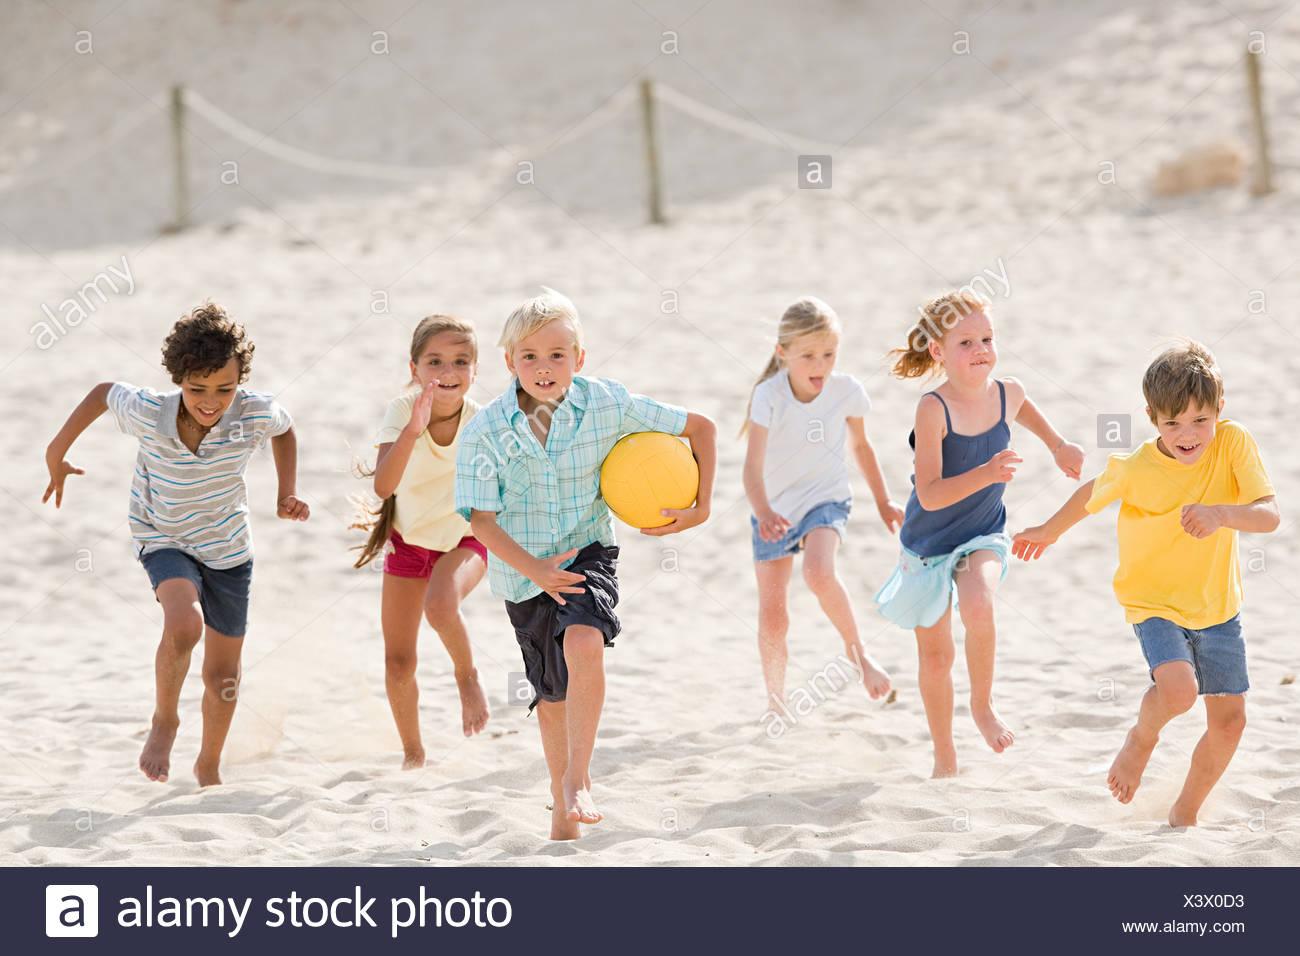 Children running across beach - Stock Image